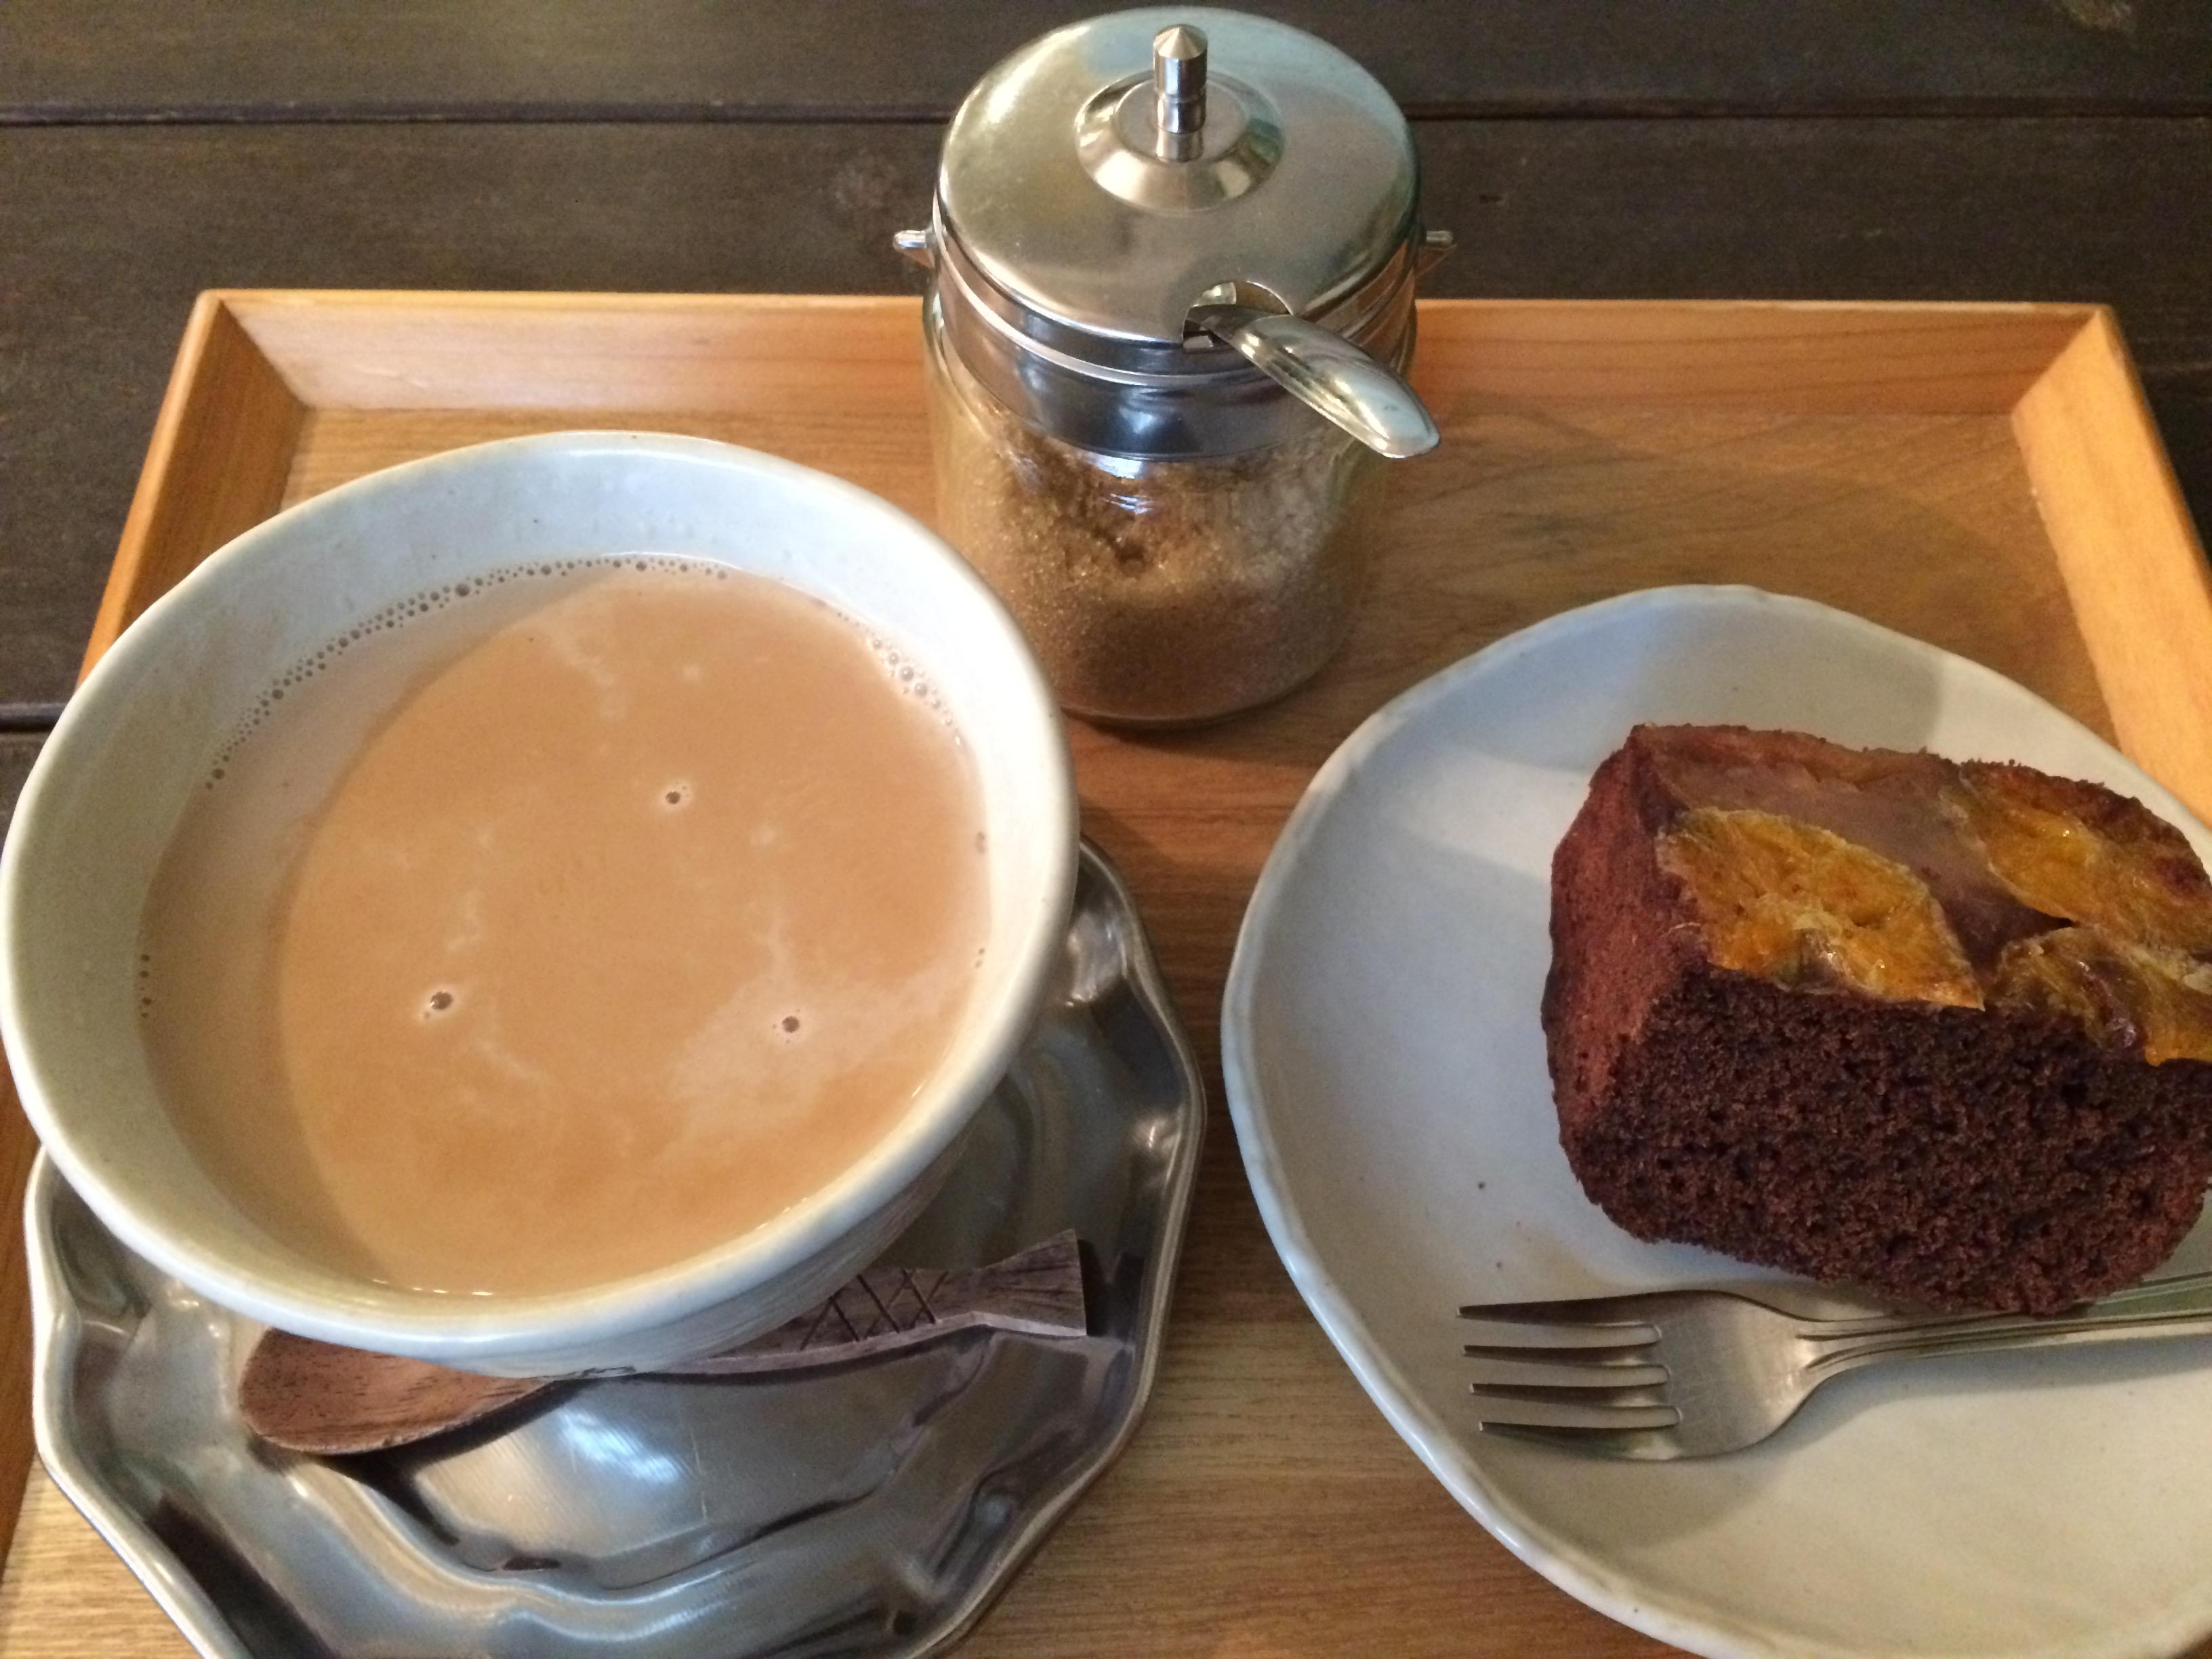 cosy cafeミカンとリンゴのココアケーキとチャイ